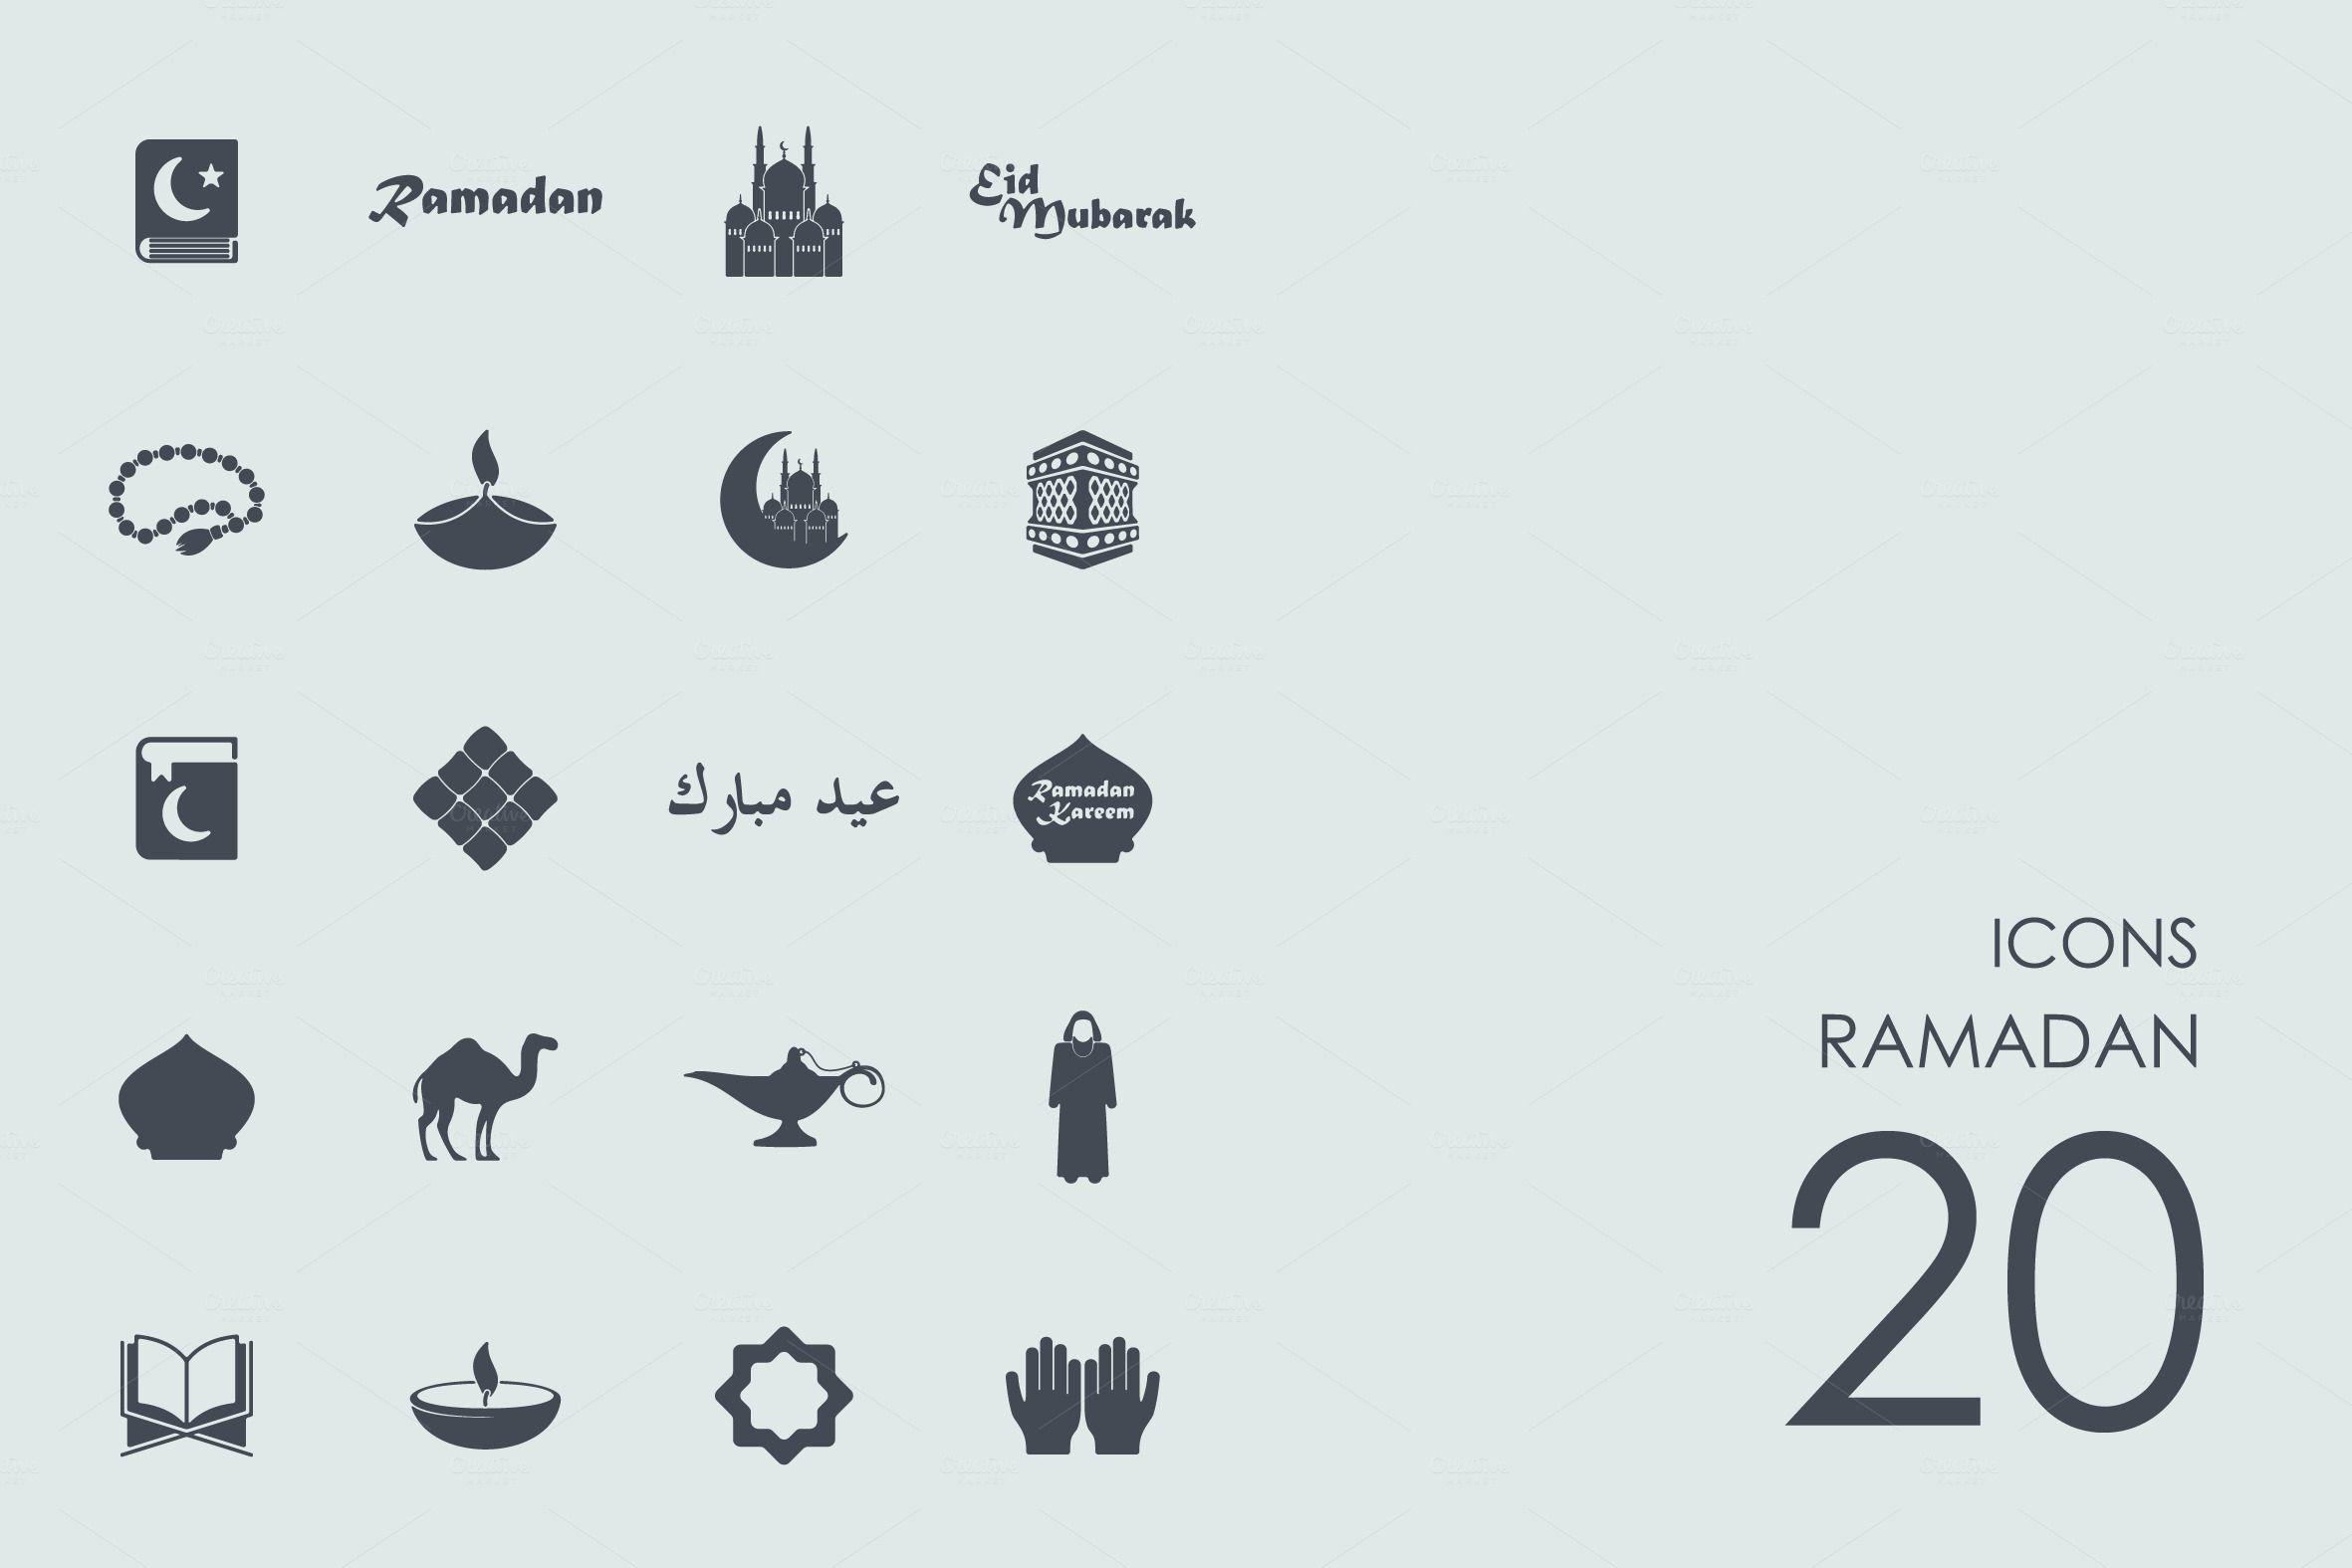 Ramadan icons by Palau on creativemarket